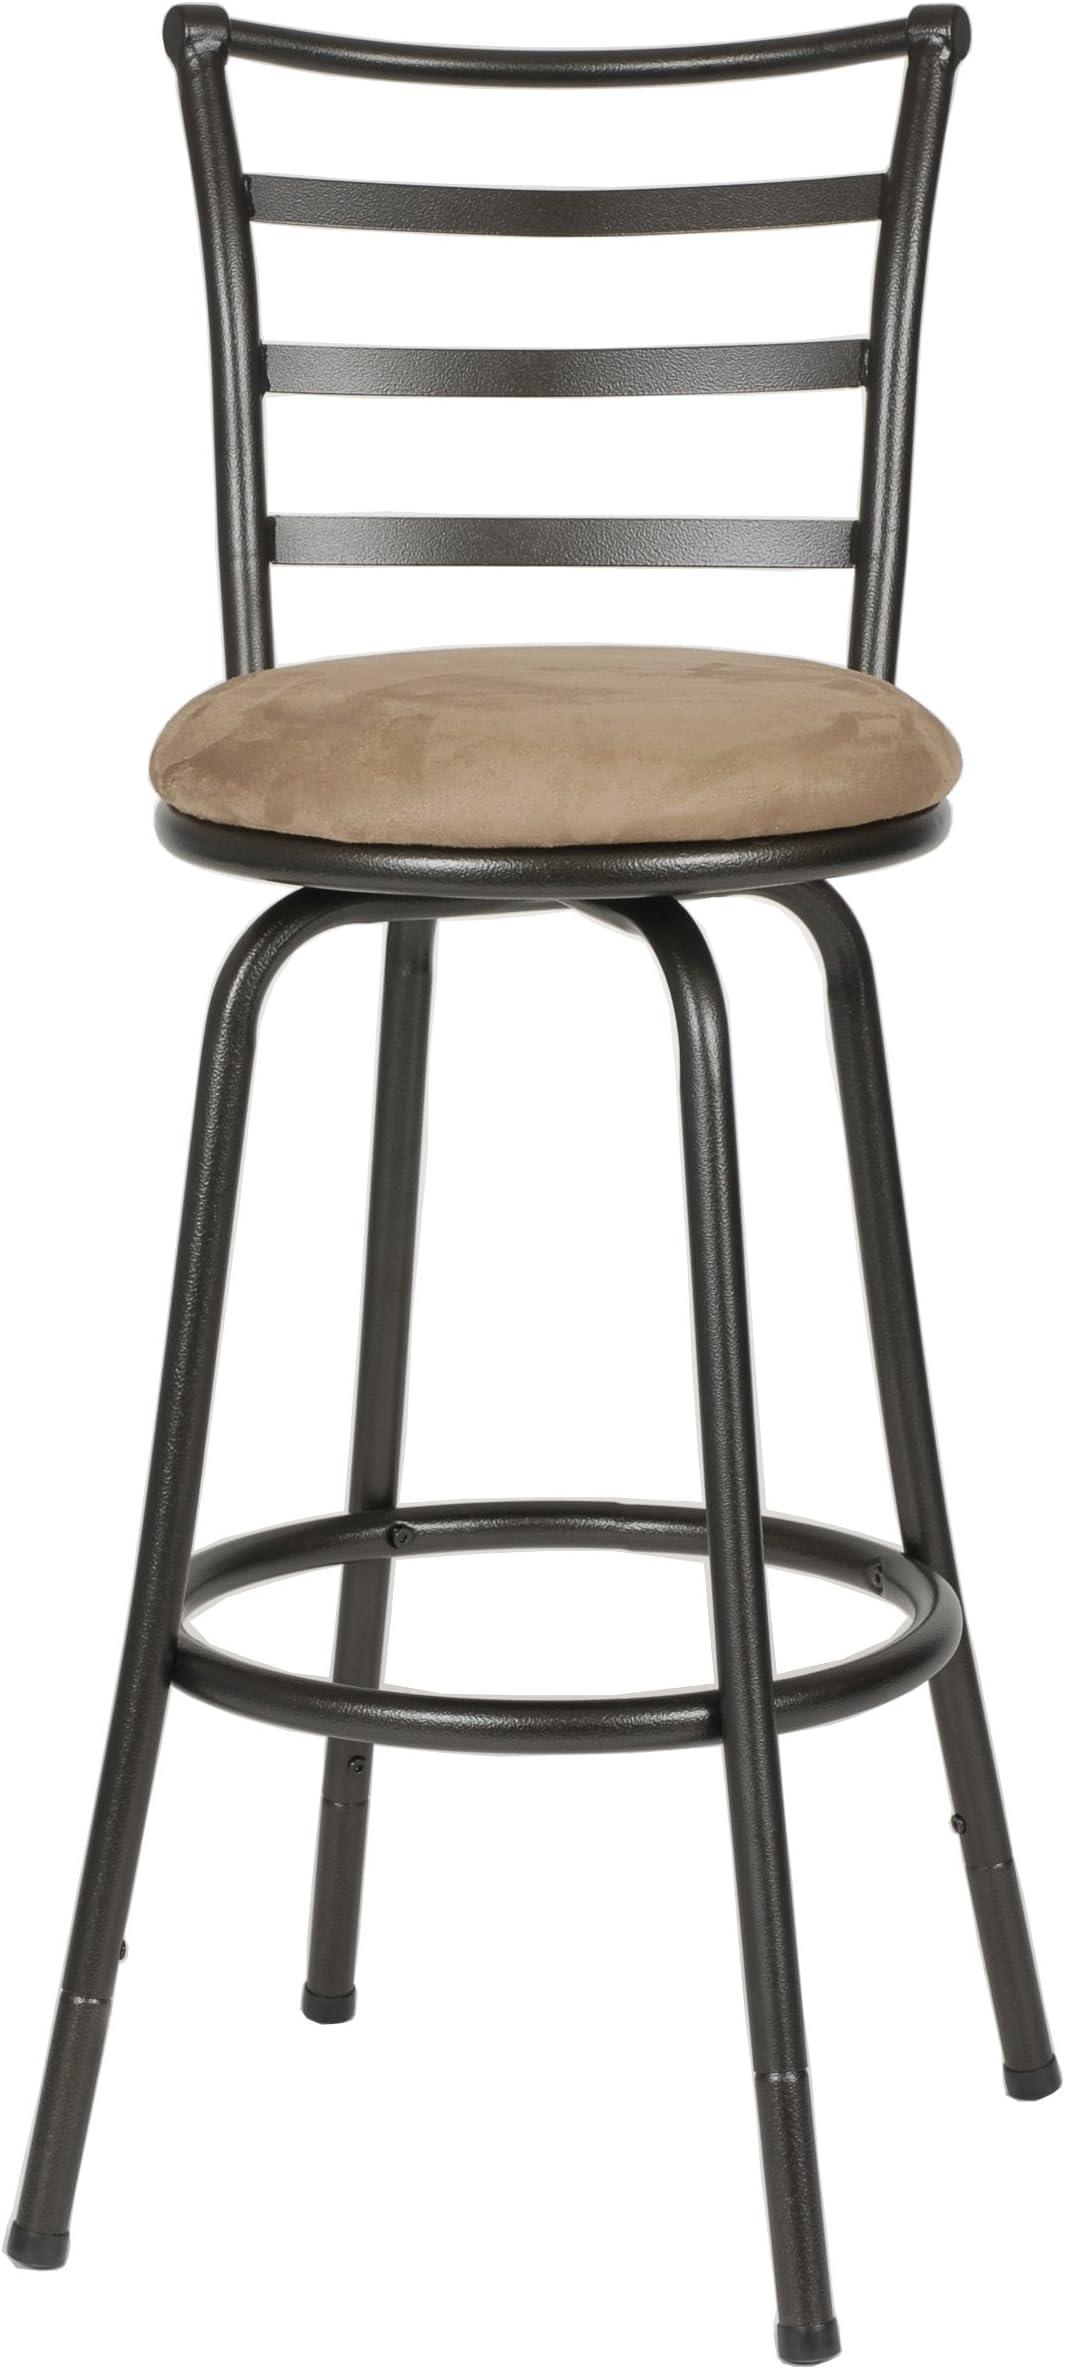 Roundhill Furniture Round Seat Bar/Counter.  sc 1 st  Amazon.com & Bar Stools | Amazon.com islam-shia.org